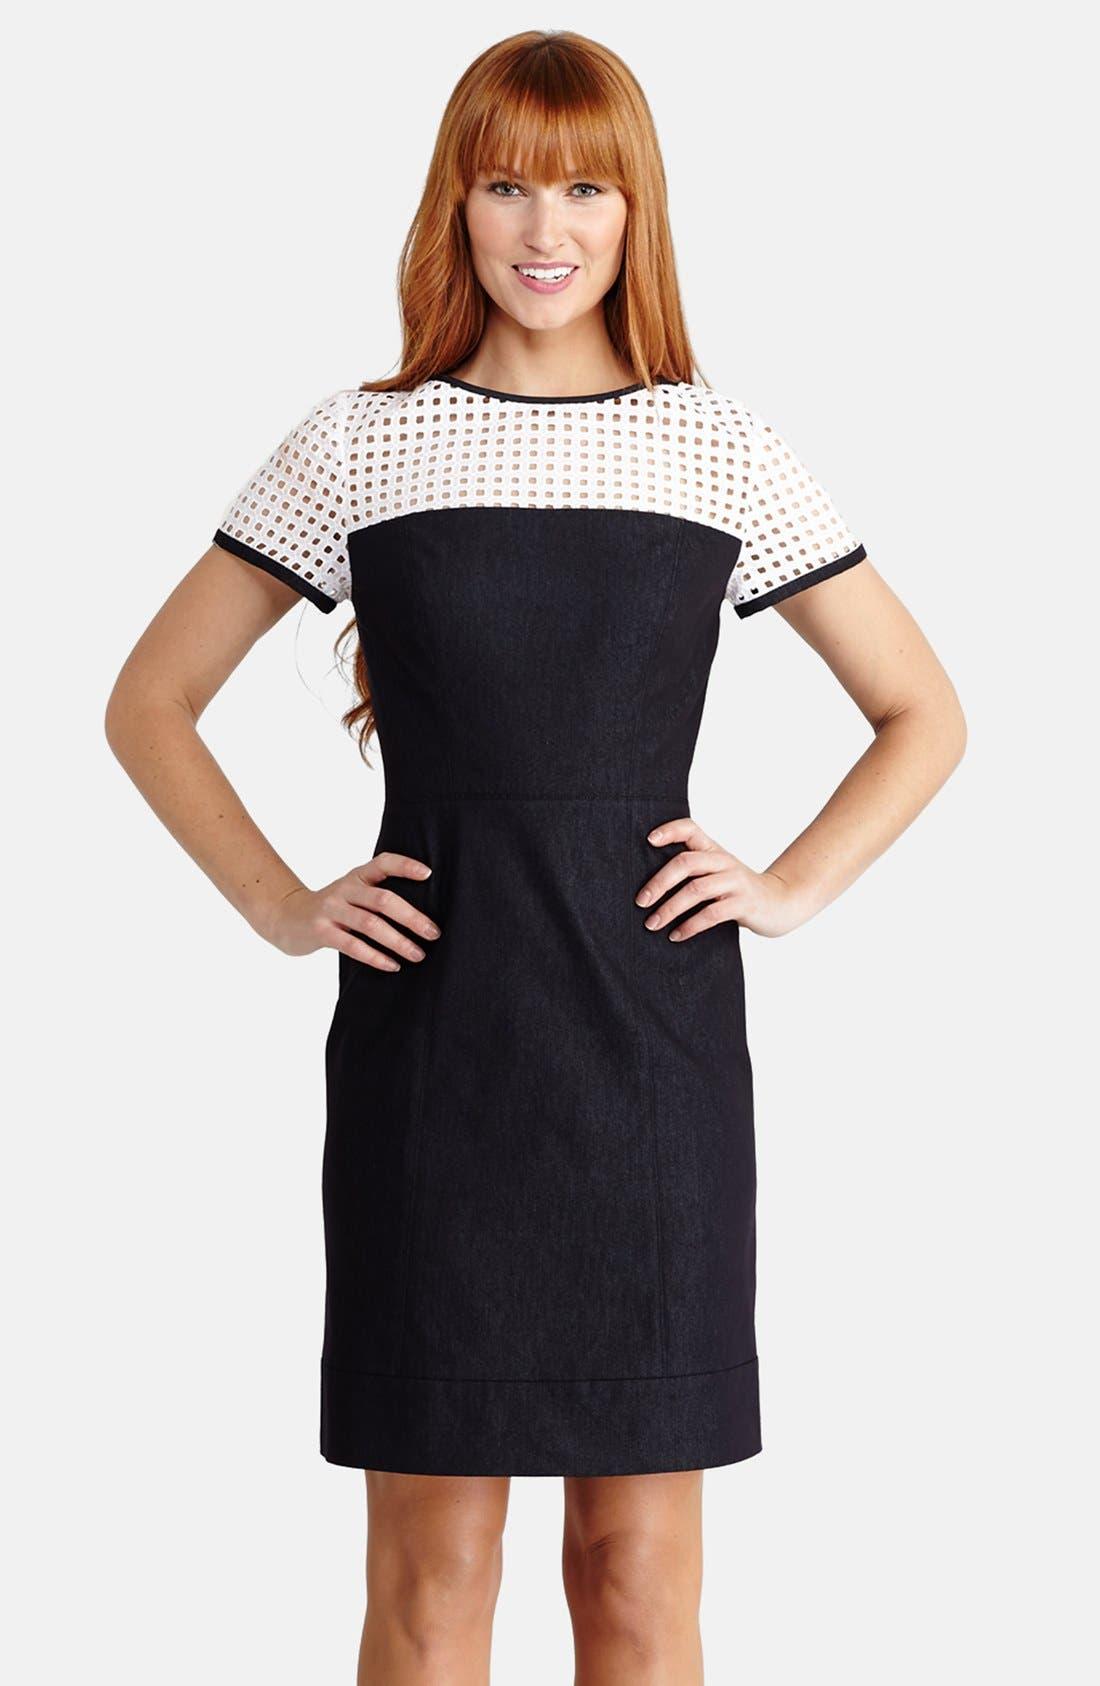 Alternate Image 1 Selected - Donna Morgan Perforated Illusion Yoke Denim Sheath Dress